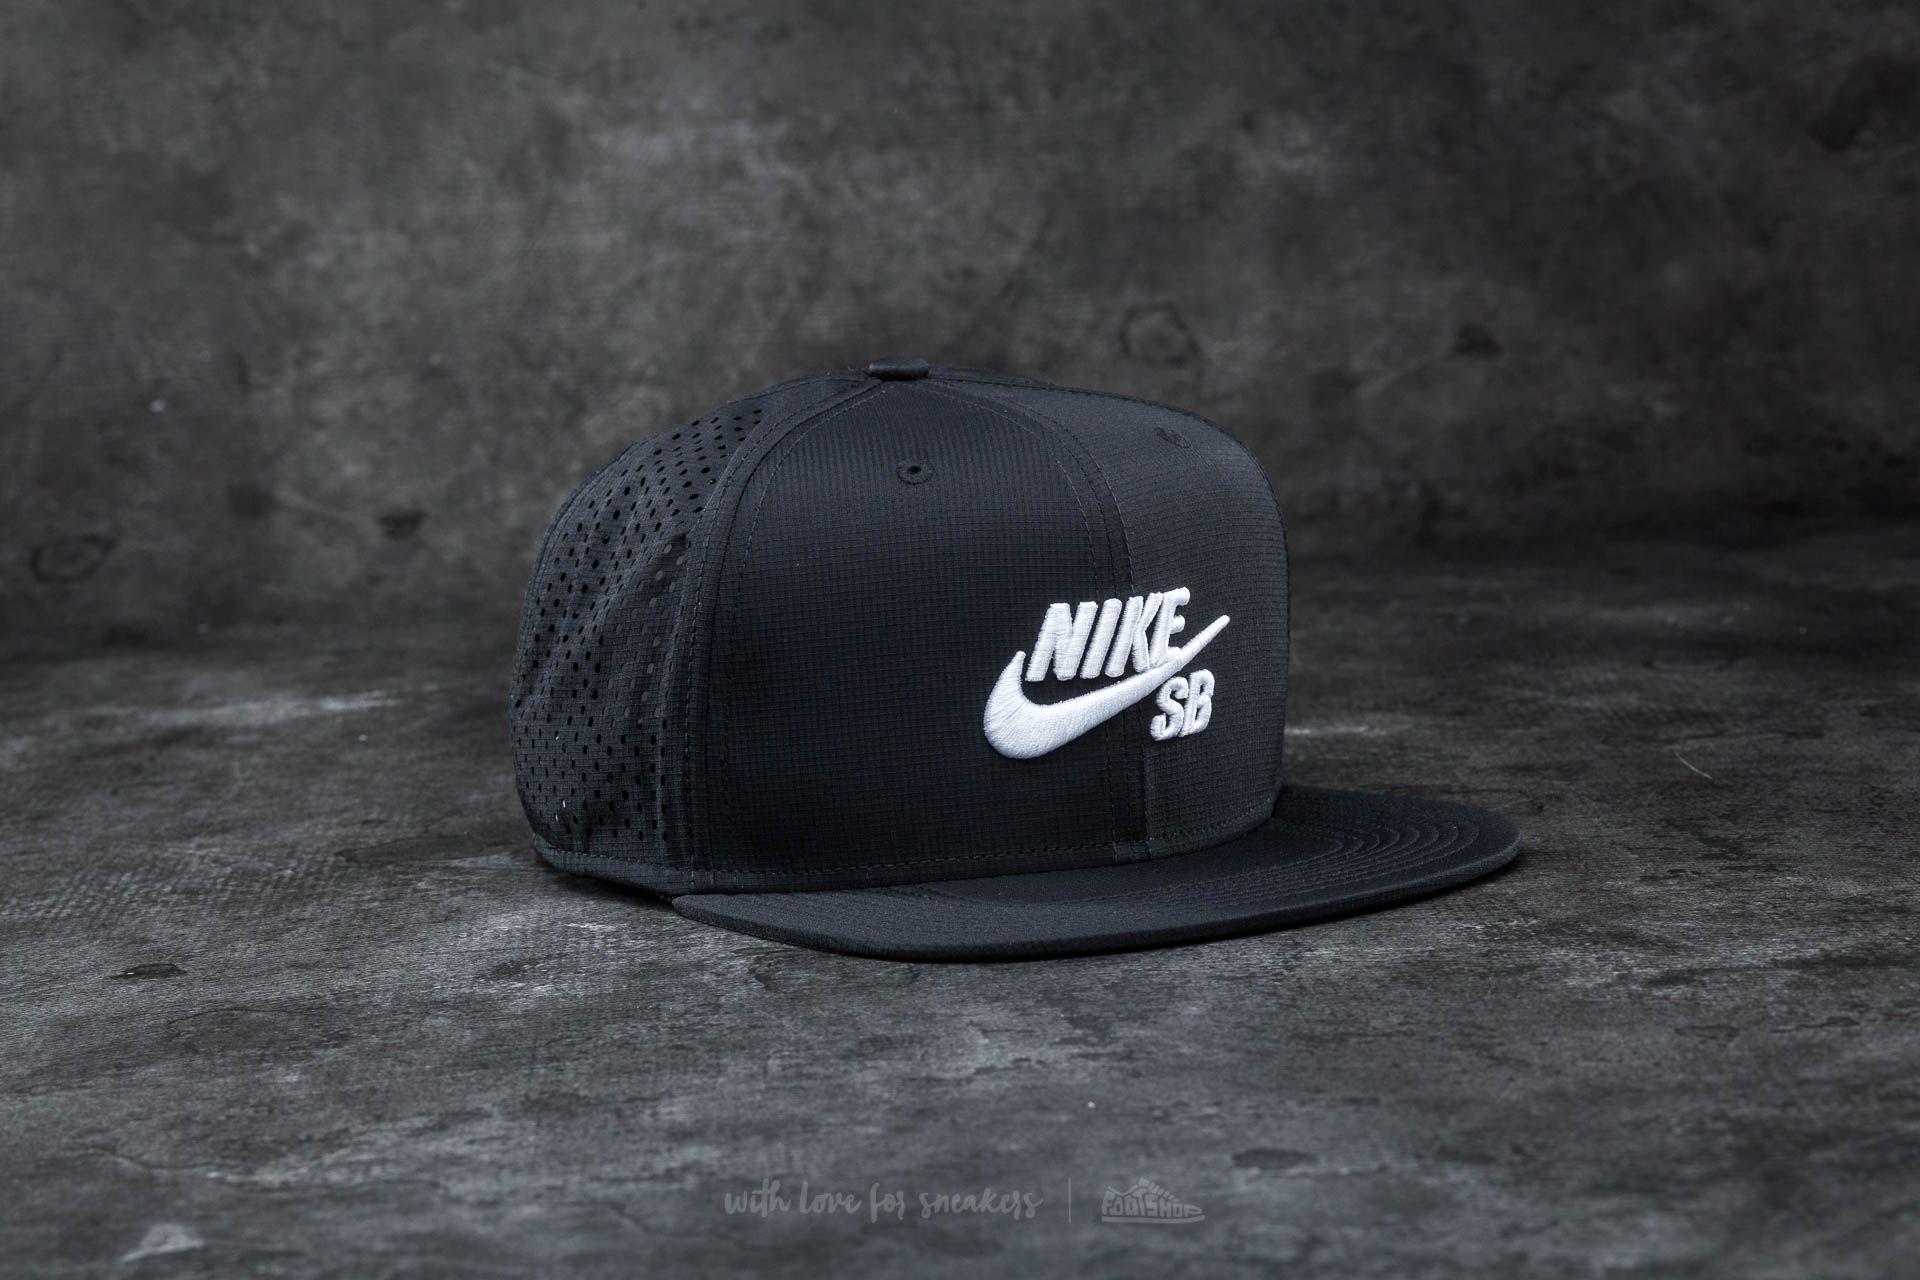 Nike SB Performance Trucker Hat Black/ White - 14713